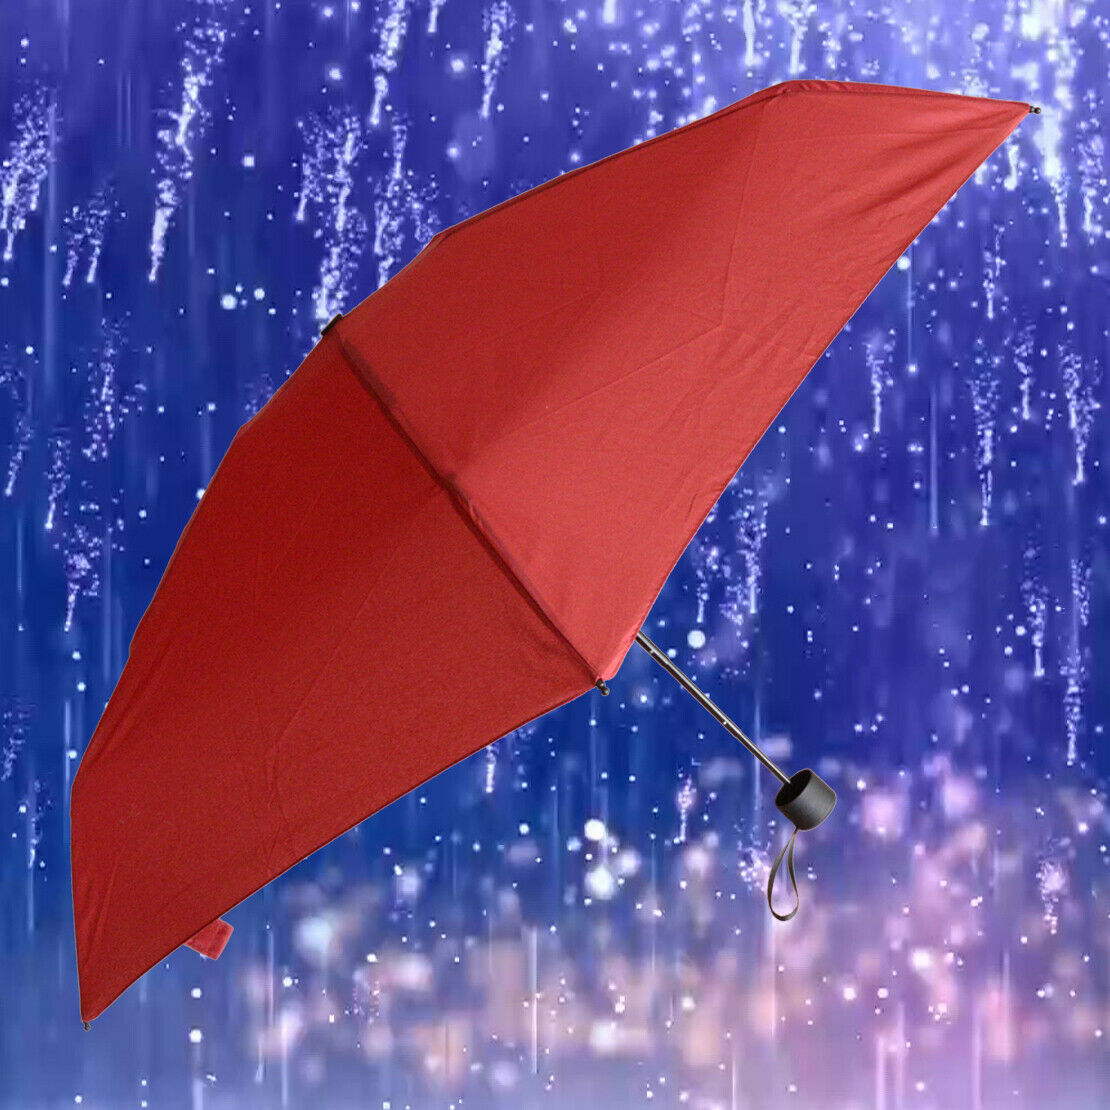 180g Small Folding Umbrella Women Anti-UV Waterproof Portable Travel Pocket cn